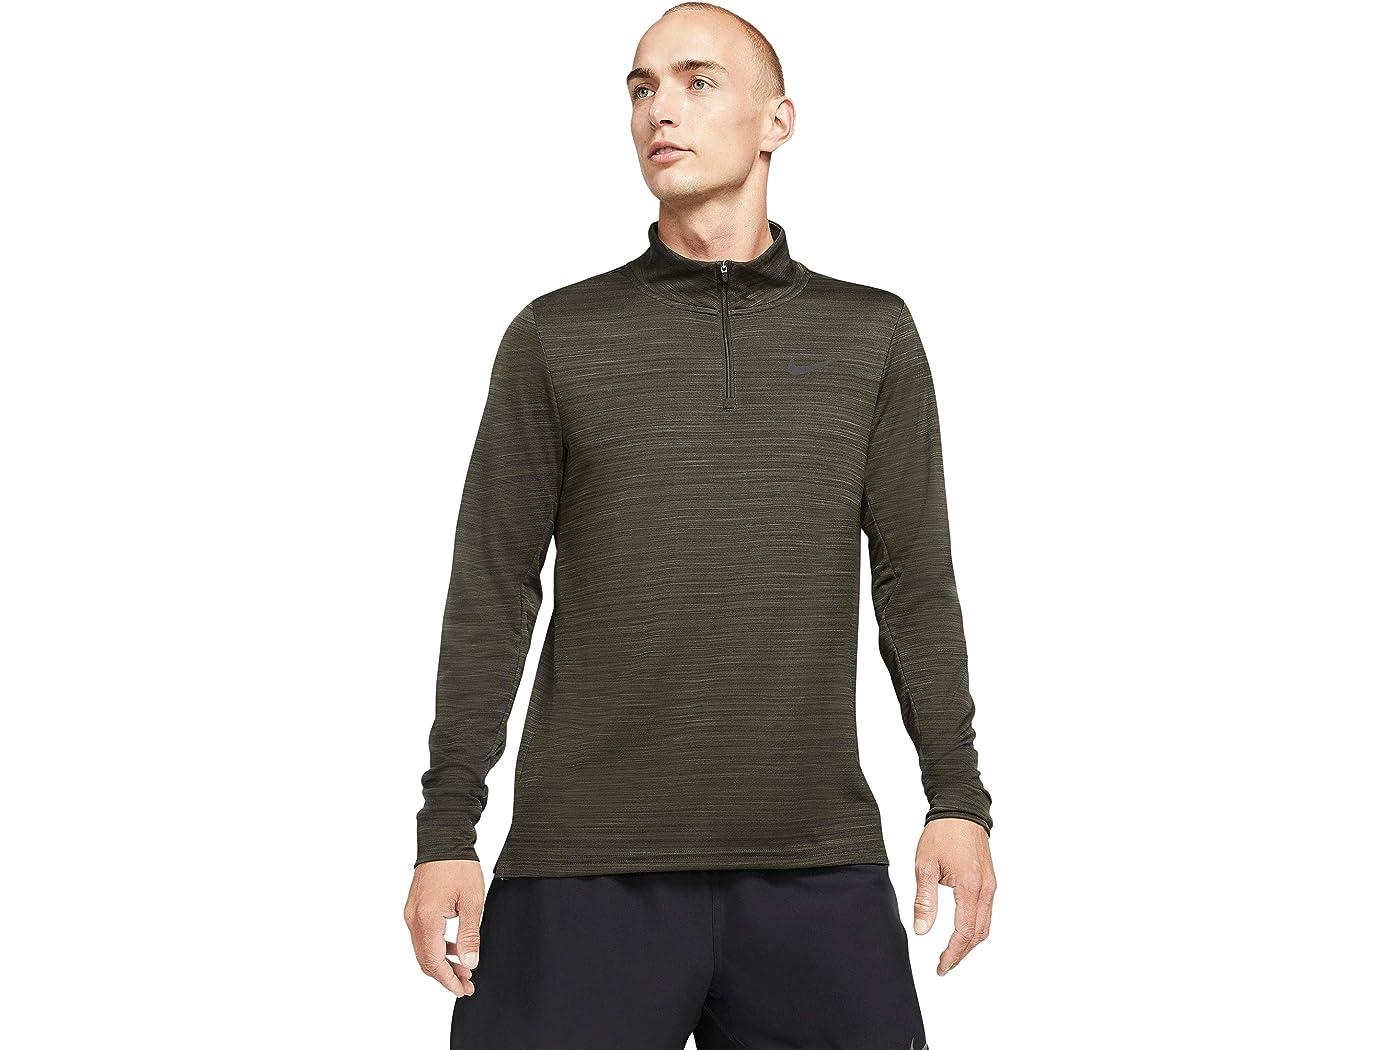 Nike Big & Tall Dry Superset Top Long Sleeve 1/4 Zip